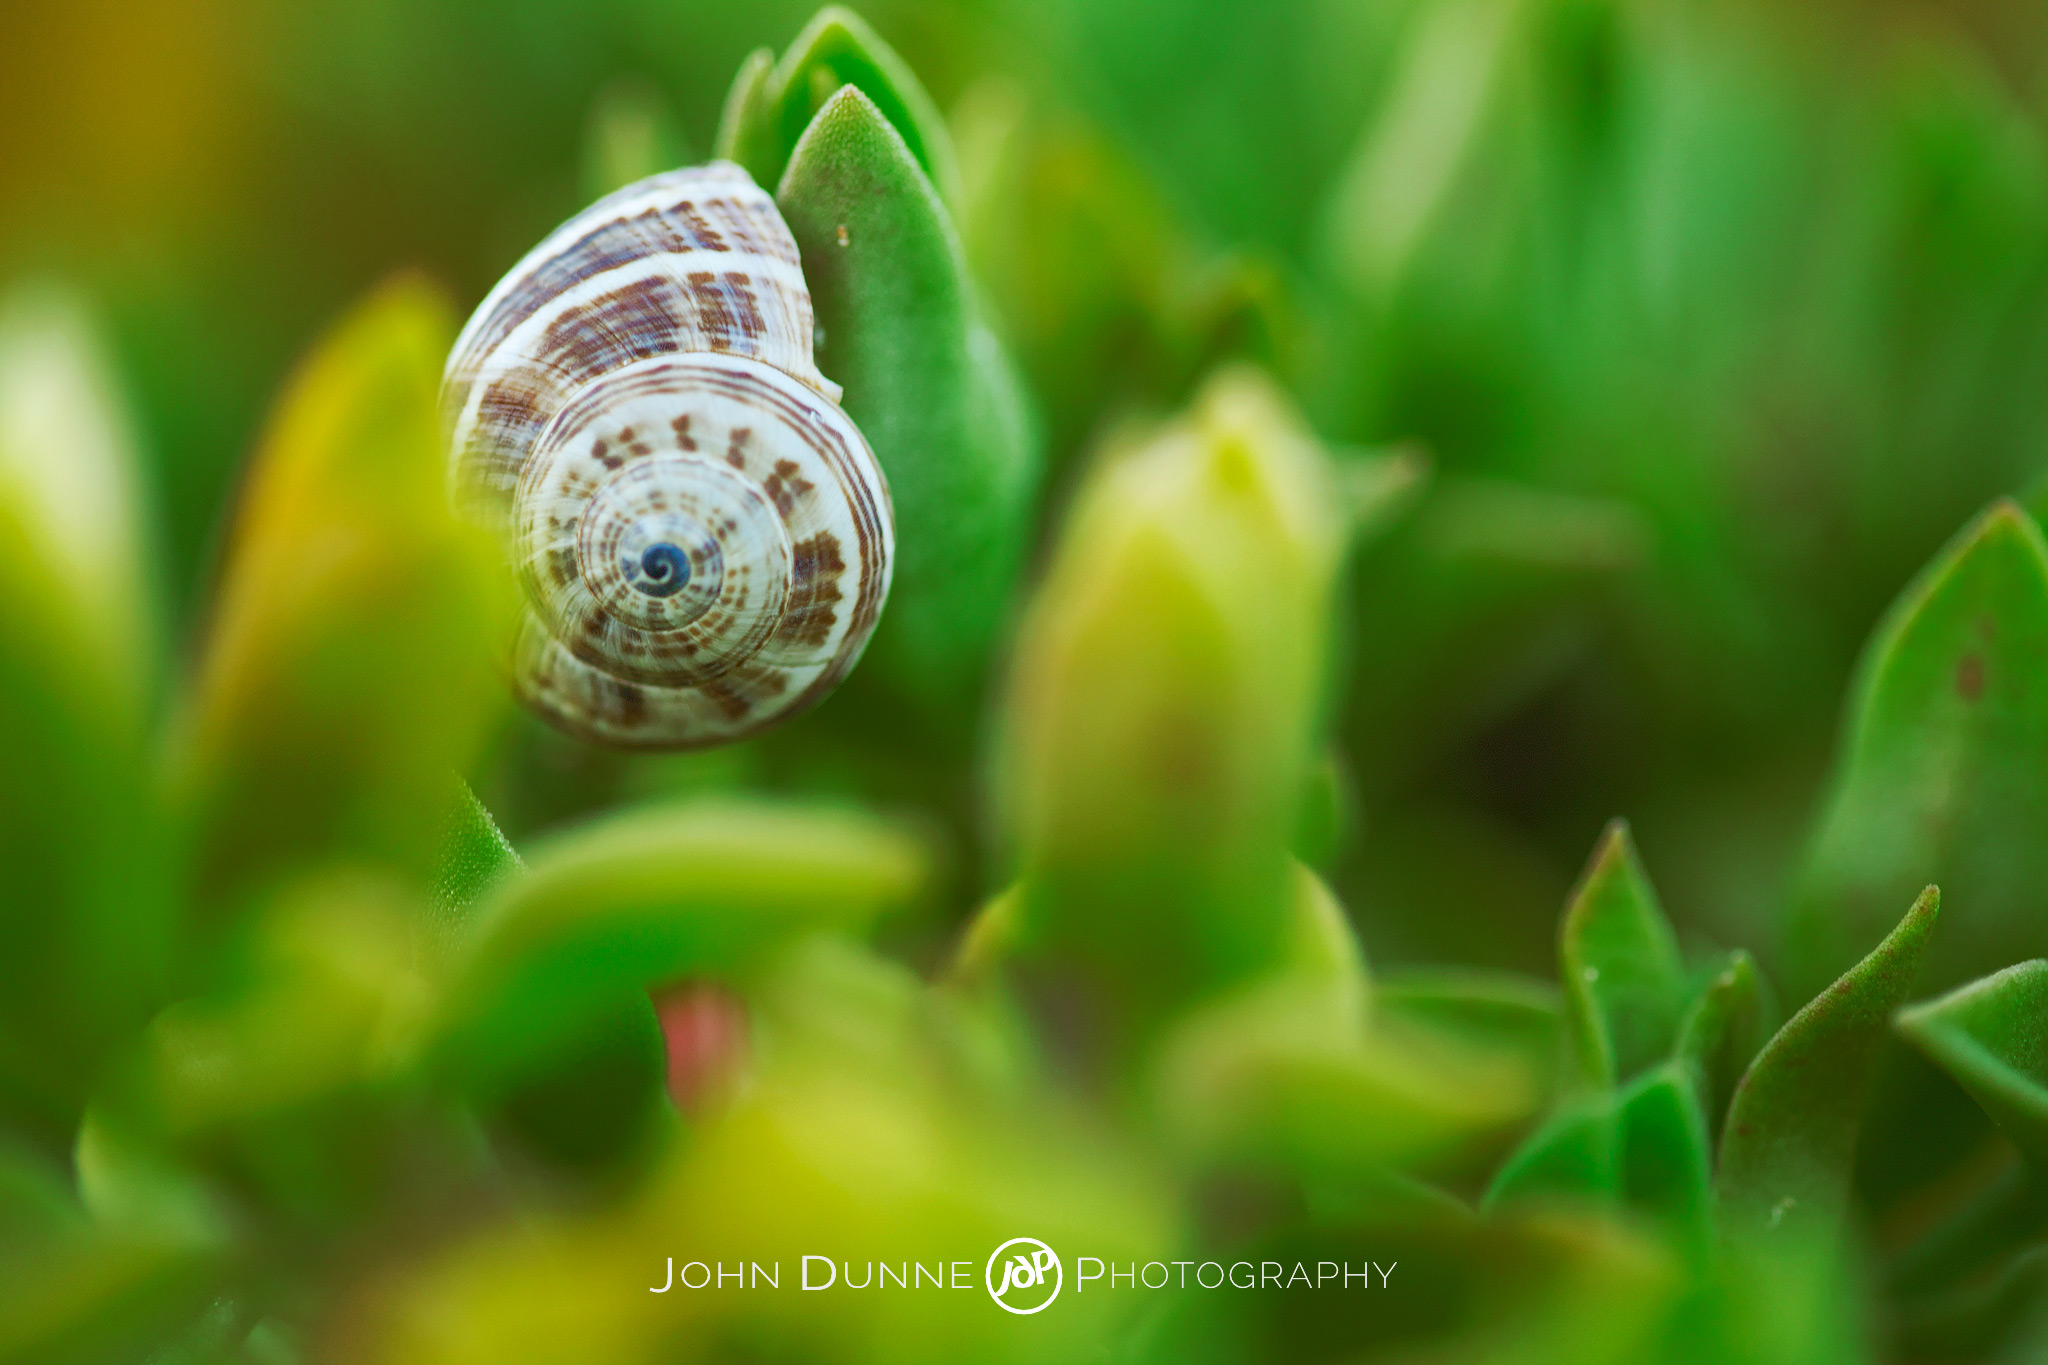 Shell We? by John Dunne 2009.